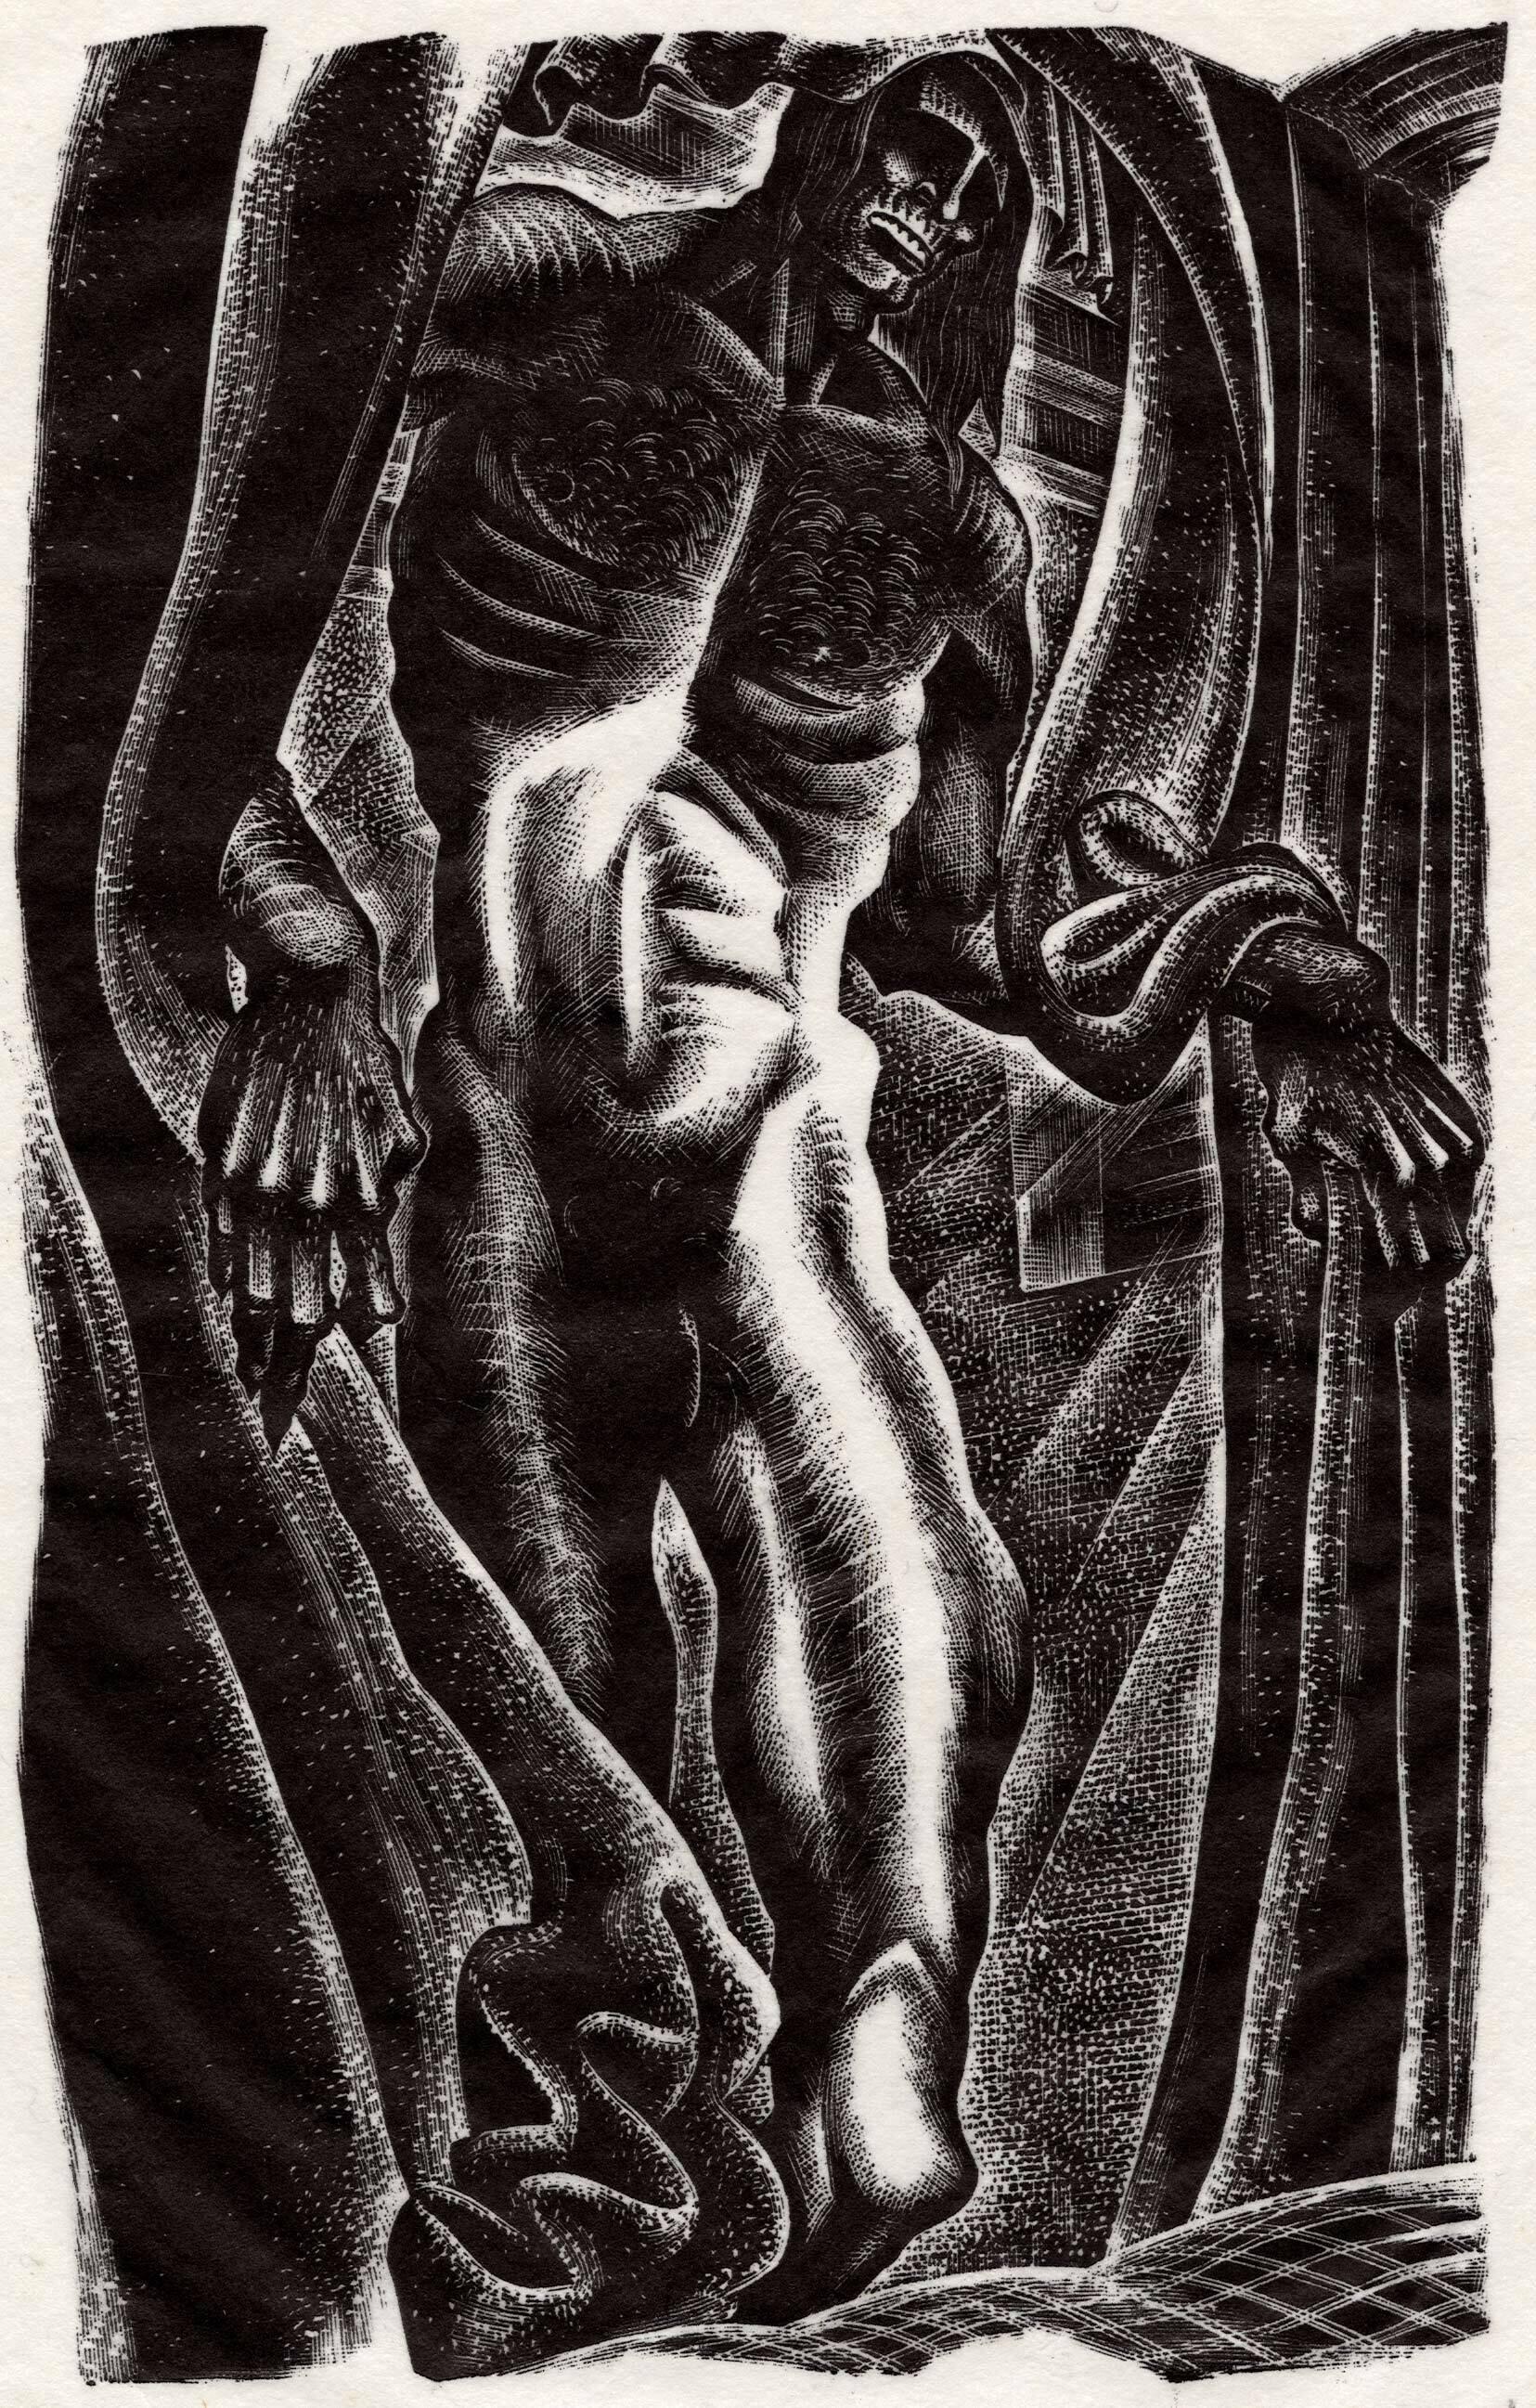 188b8834409 Lynd Ward illustration for a 1934 edition of  Frankenstein